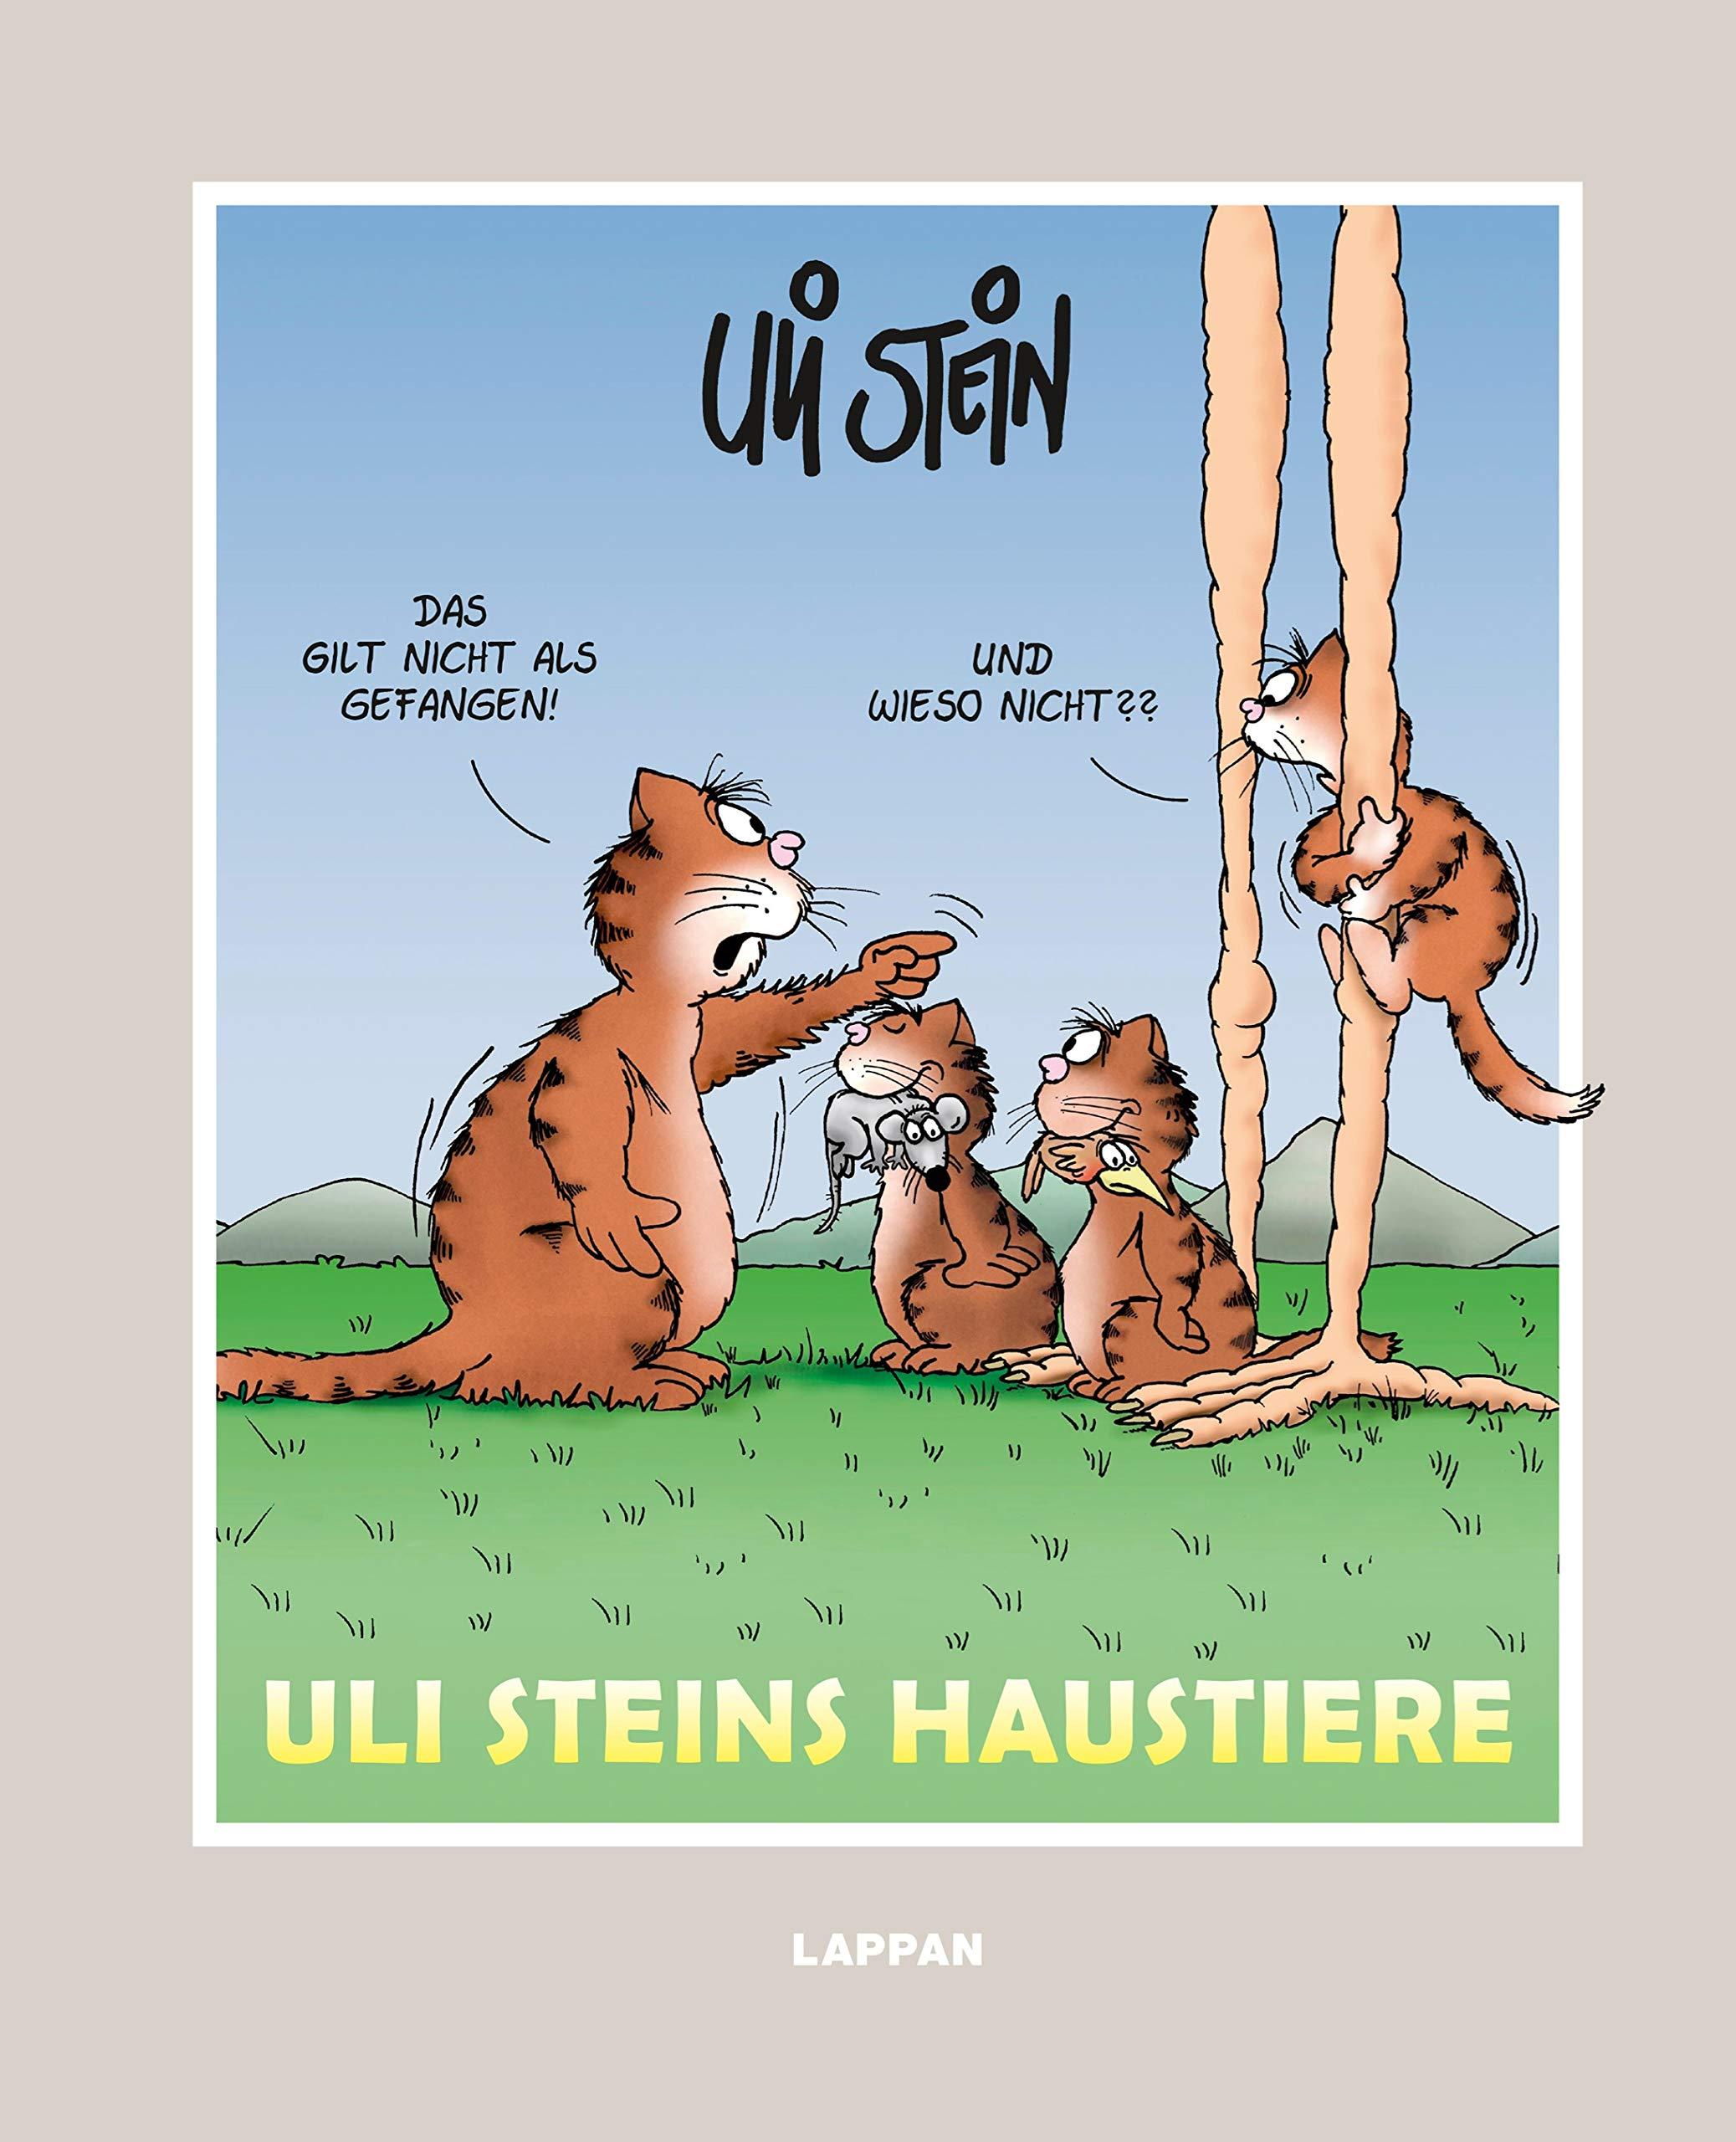 Uli Steins Haustiere Gebundenes Buch – 14. August 2013 Lappan 3830333366 HUMOR / General Comic / Theorie